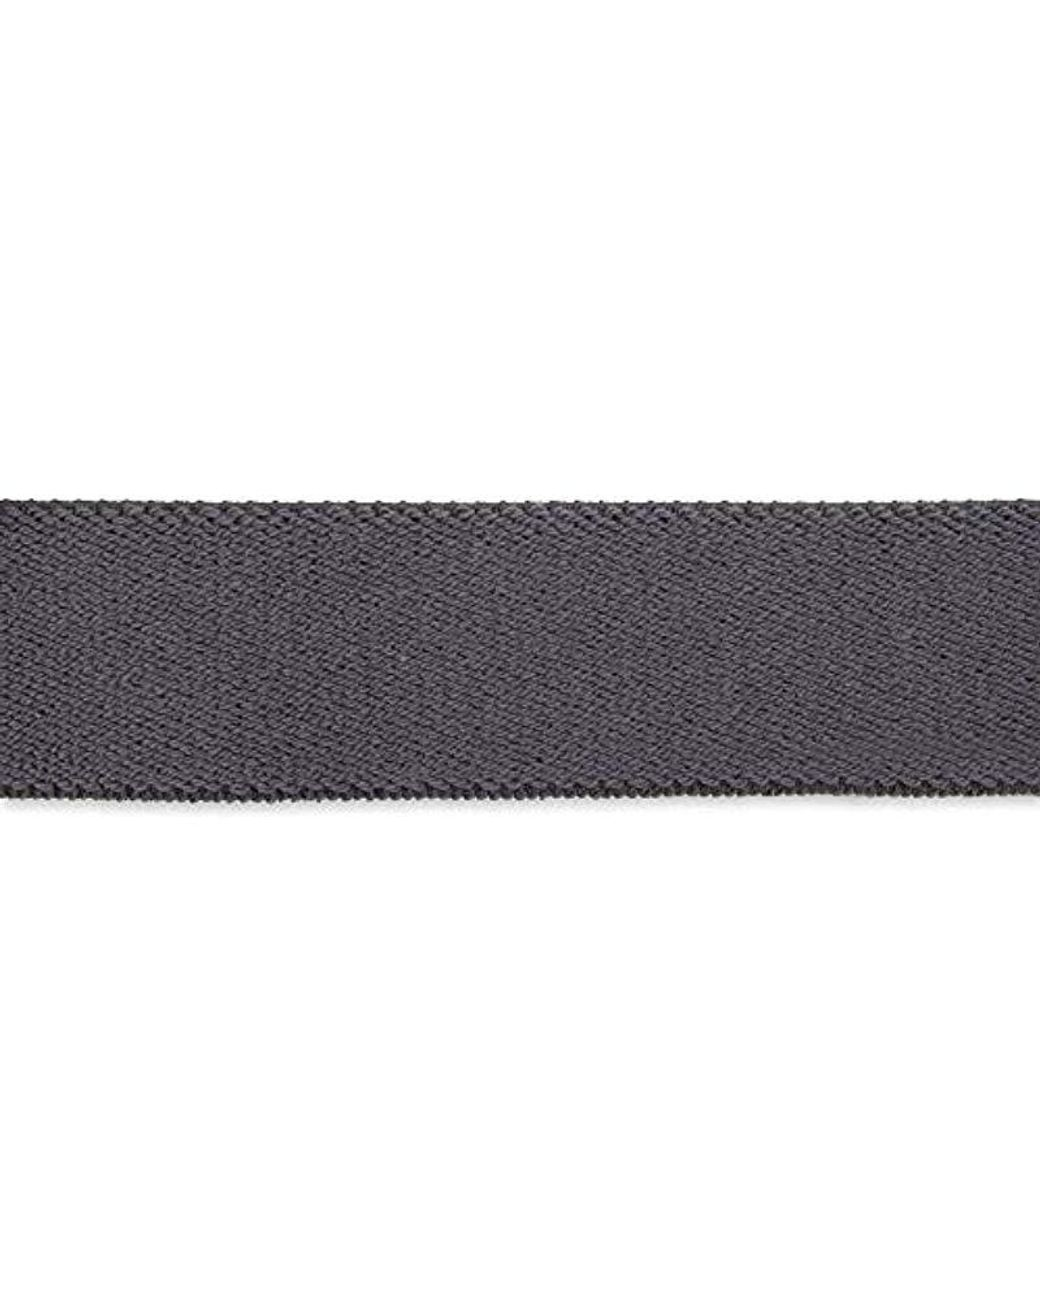 Dickies Mens 1-1//2 Solid Straight Clip Suspender,Black,